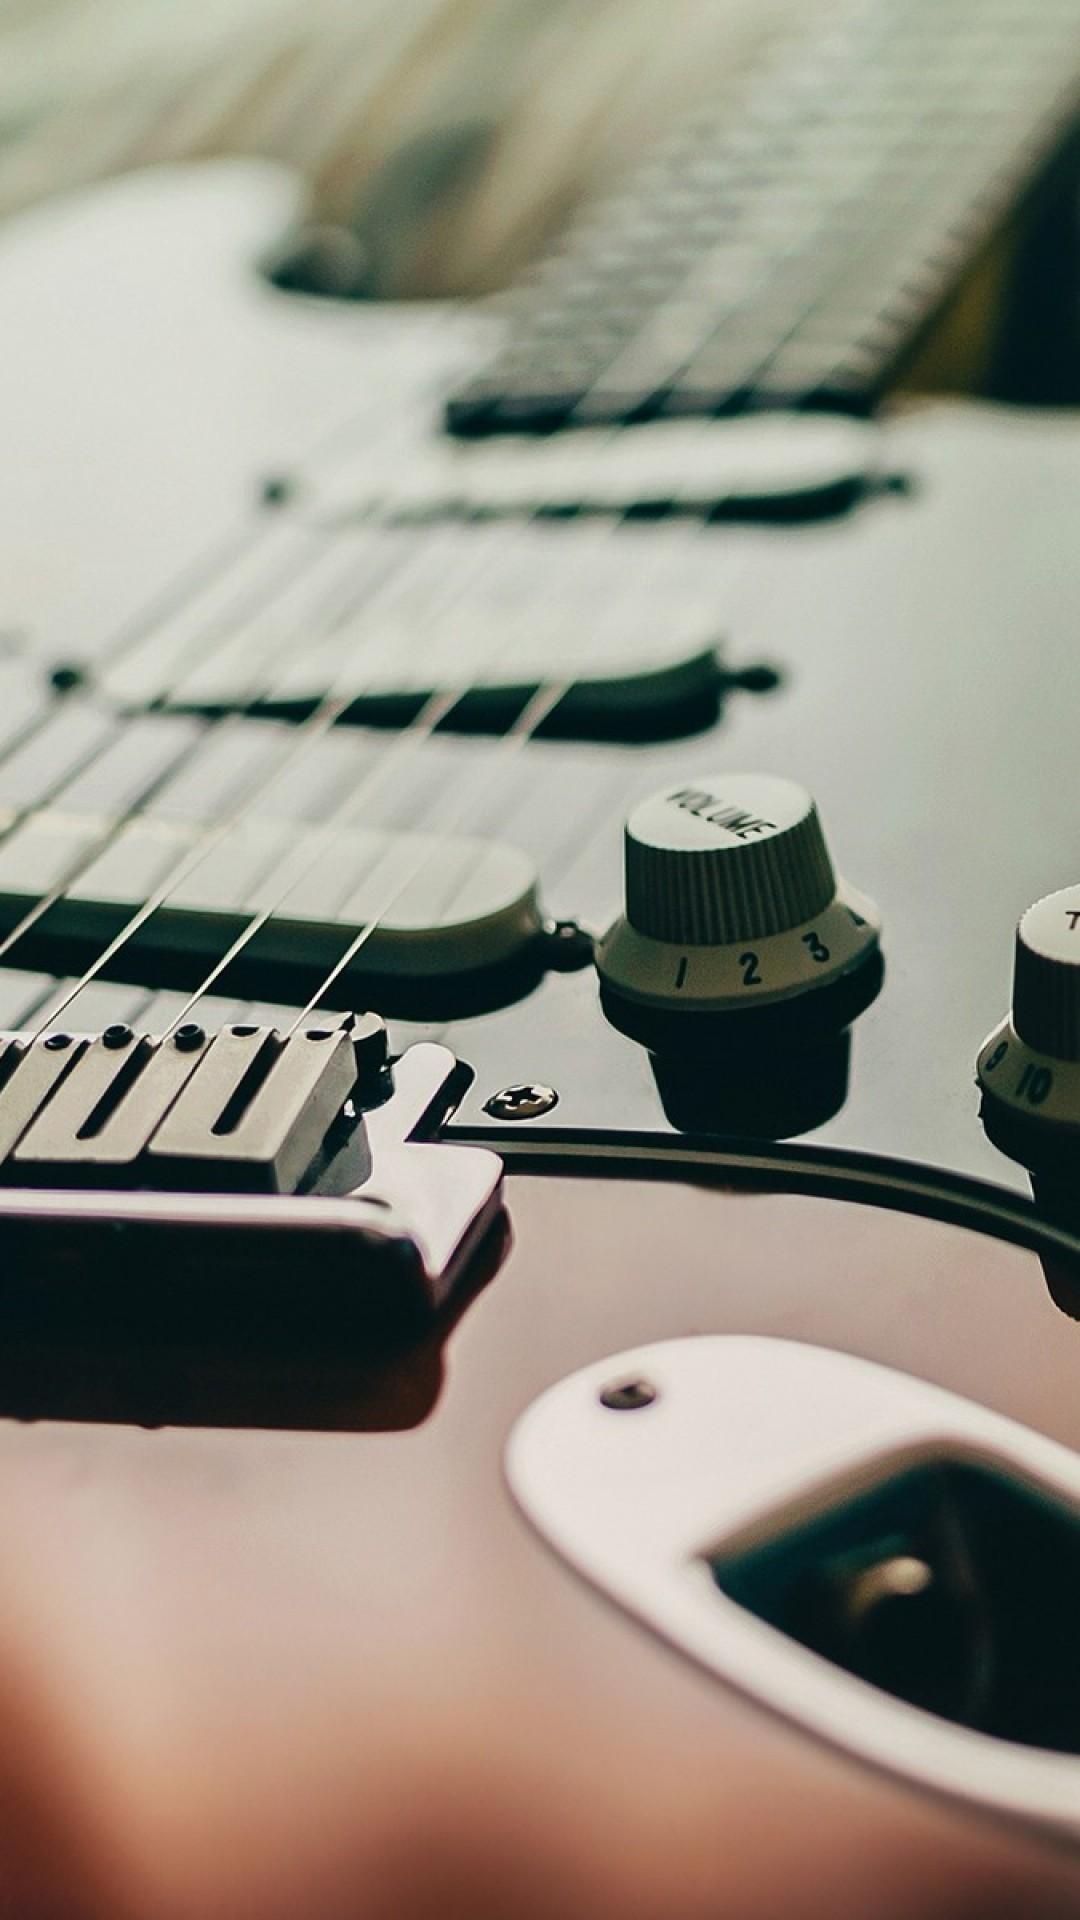 1920x1200 Guitar Guitar